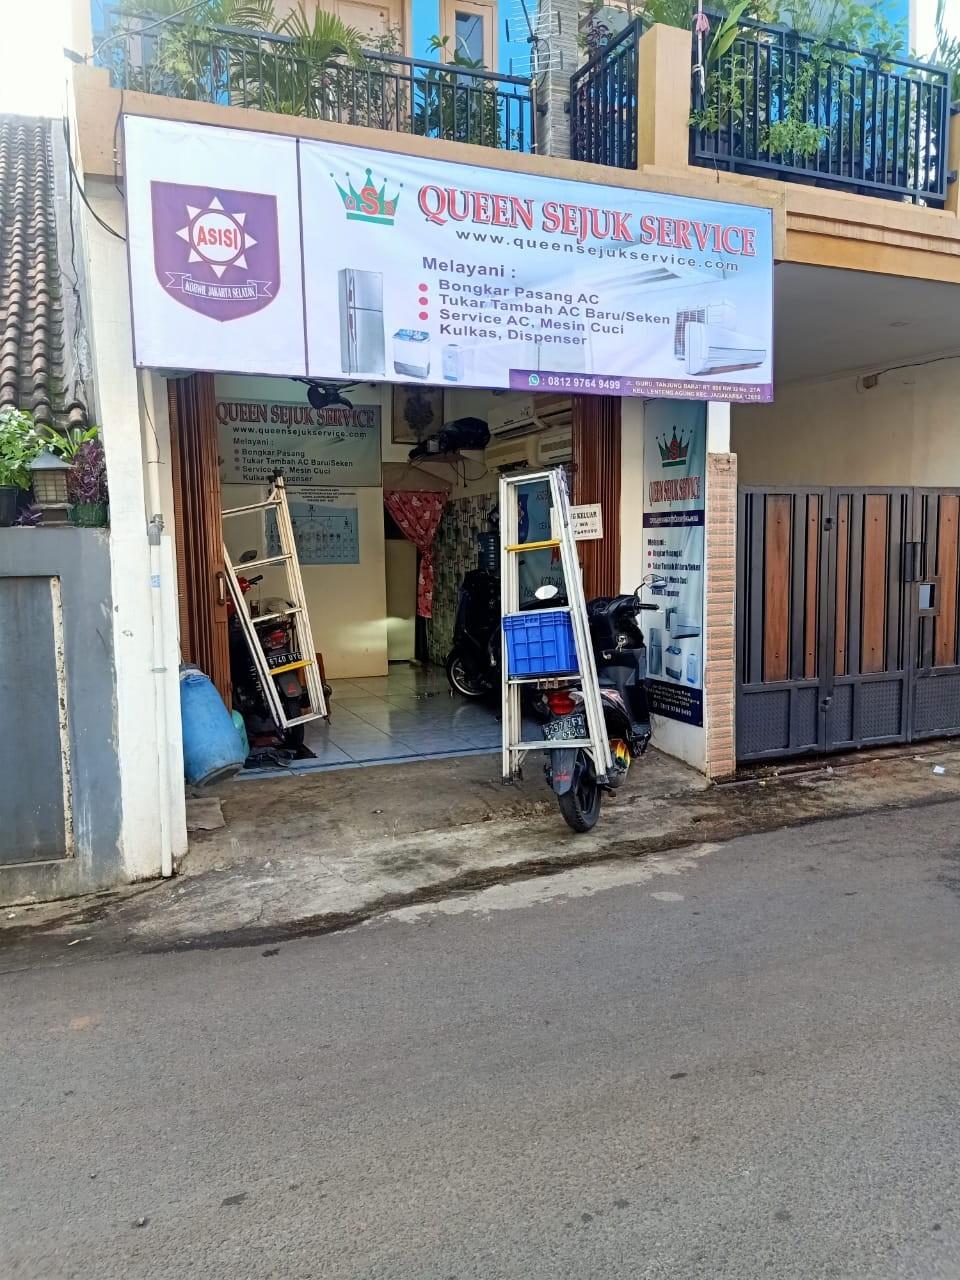 Service AC Jakarta Selatan QUEEN SEJUK SERVICE